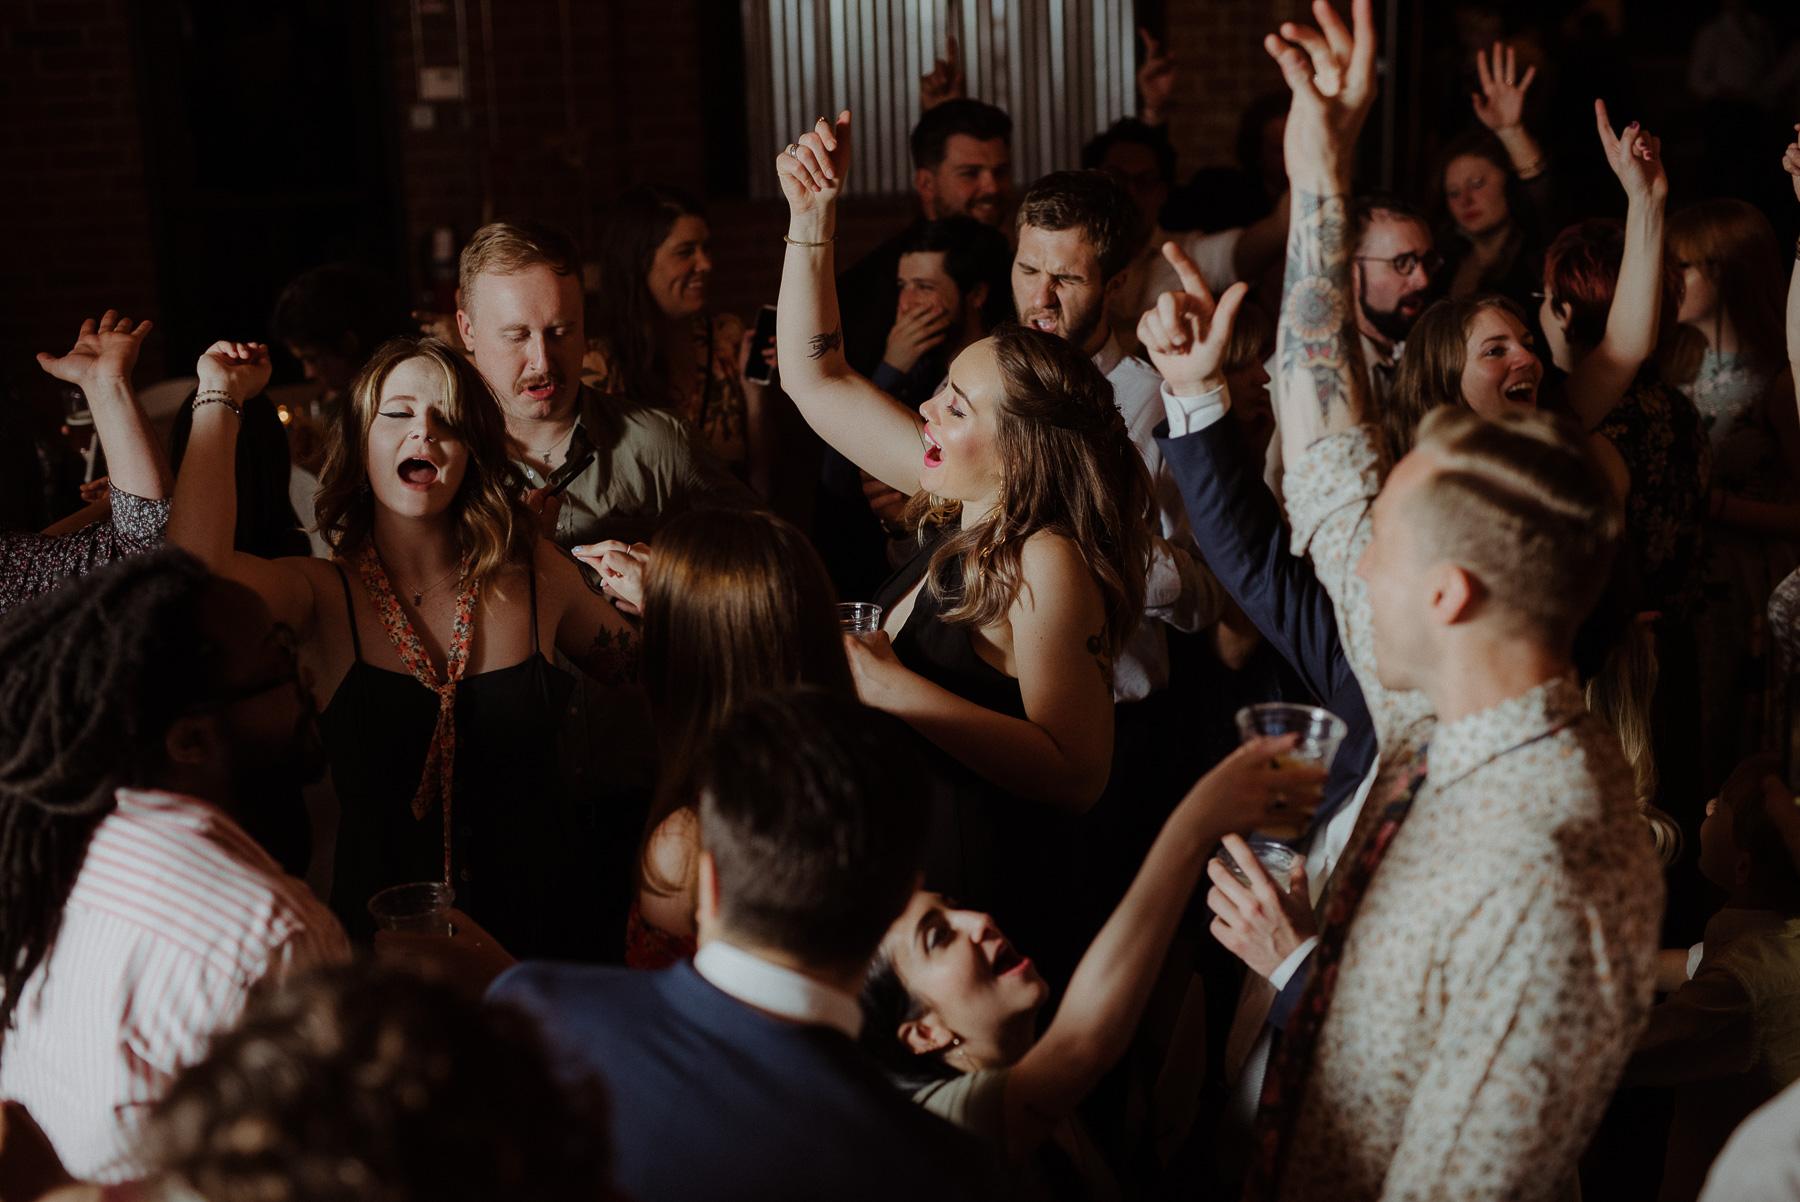 enowen-wedding-photography-mike-anna-suffolk-punch-charlotte (67 of 78).jpg